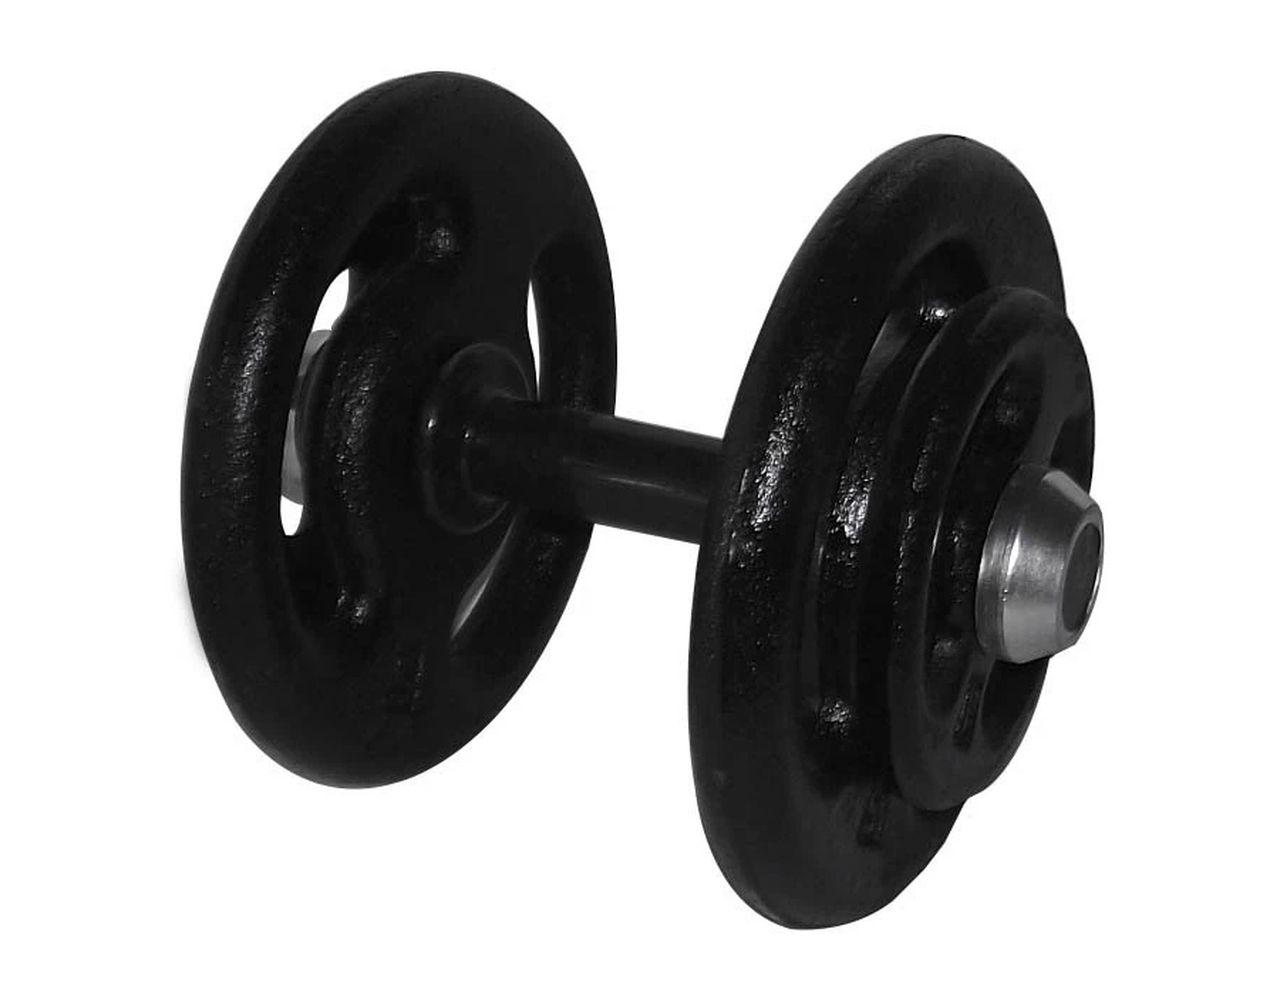 Dumbbell Pintado Pegada Emborrachada Academia Fitness 18kg  - Panela de Ferro Fundido